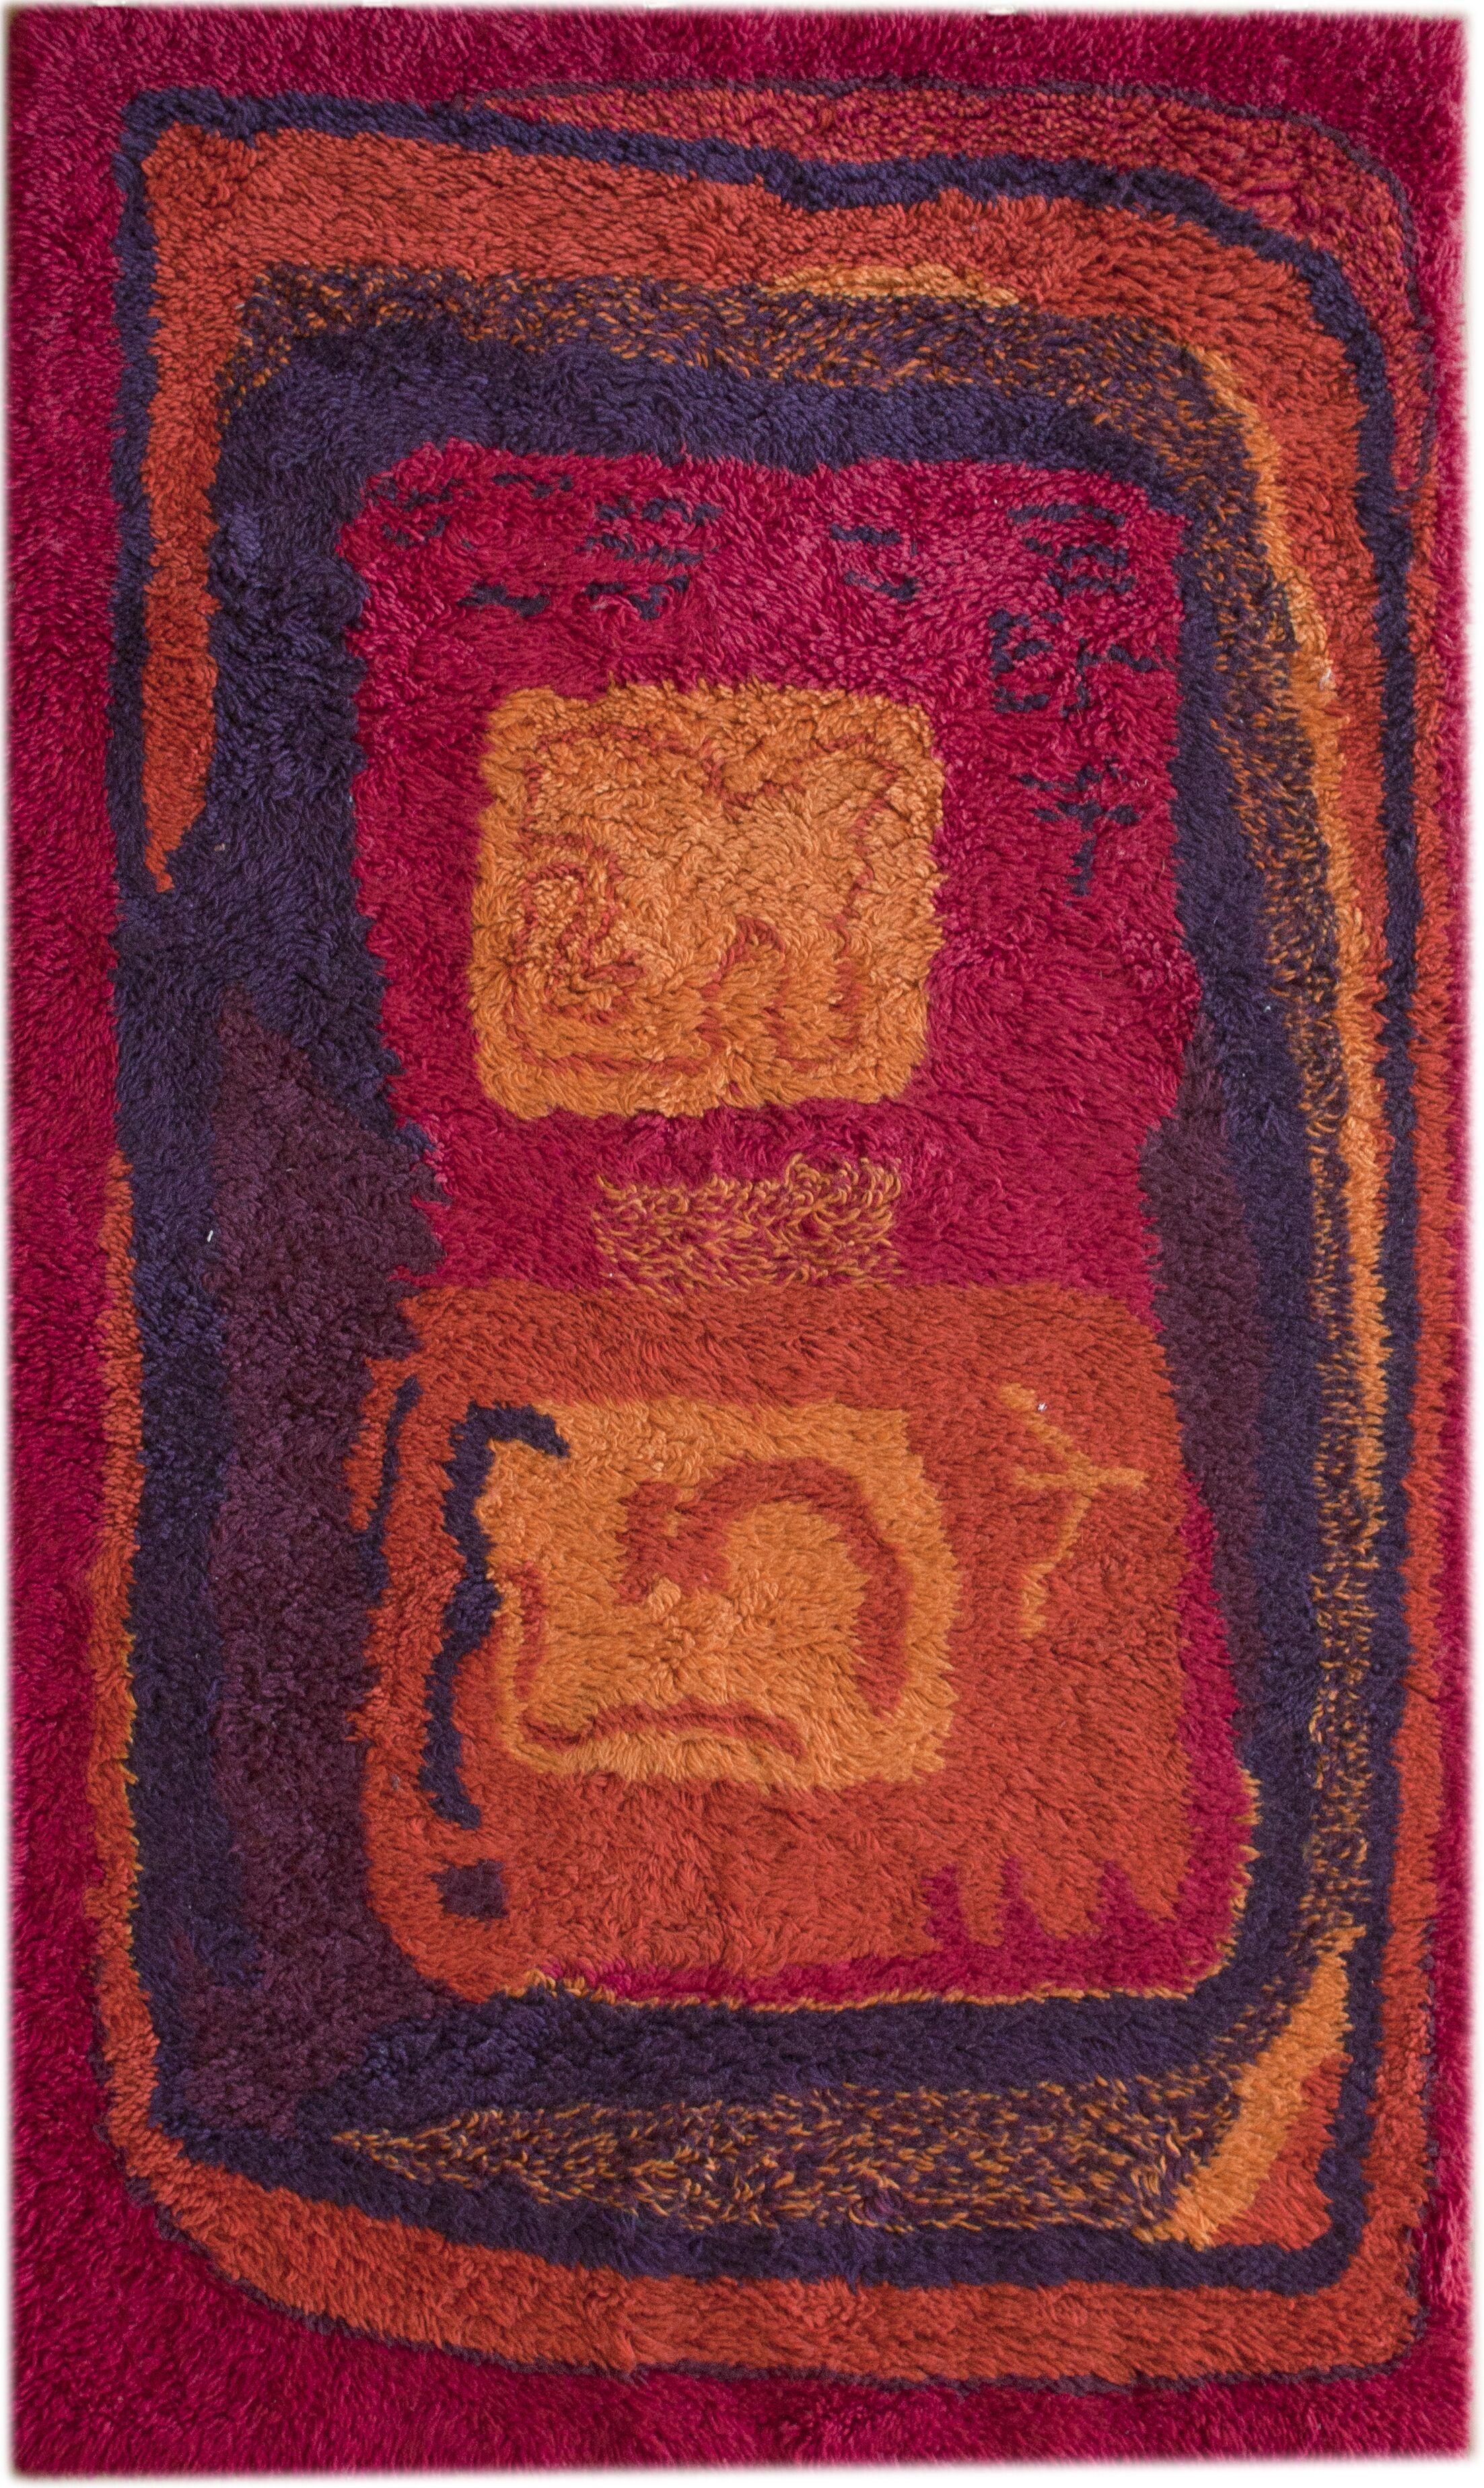 Rya Ashford Invigorate Hand-Tufted Wool Red/Black Area Rug Rug Size: Rectangle 6' x 9'